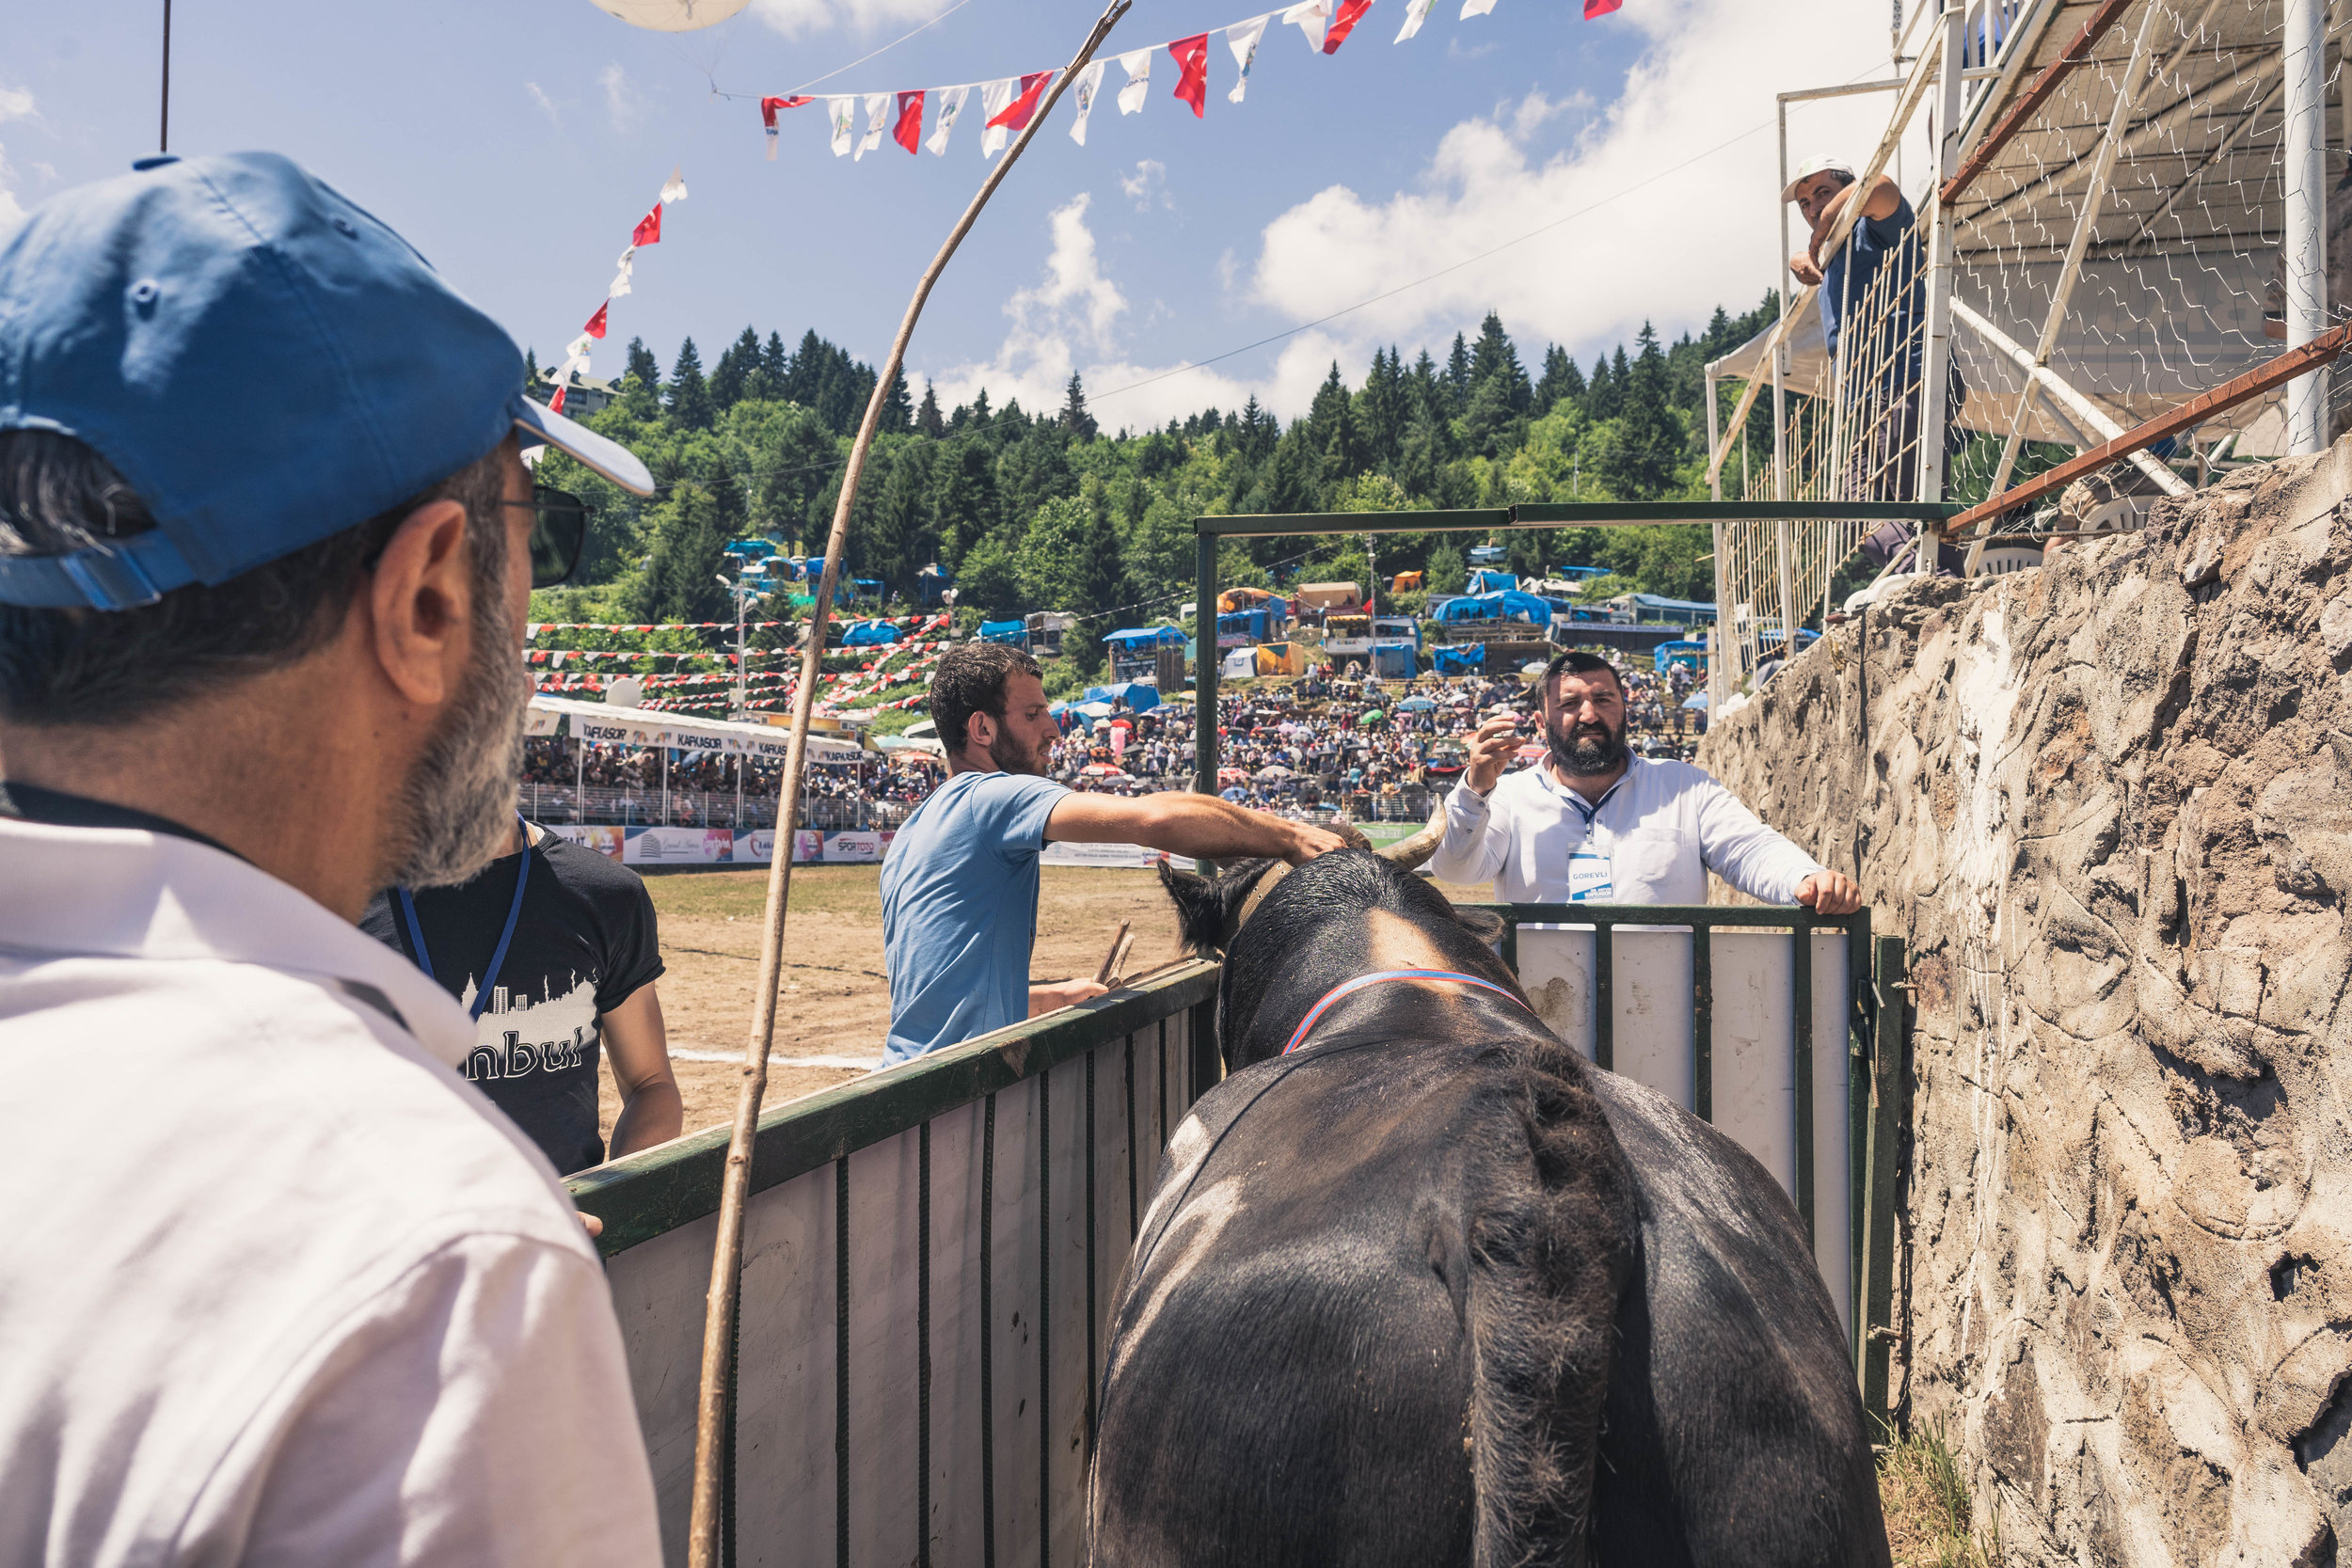 Getting the bulls ready, Kafkasör 2018, Artvin